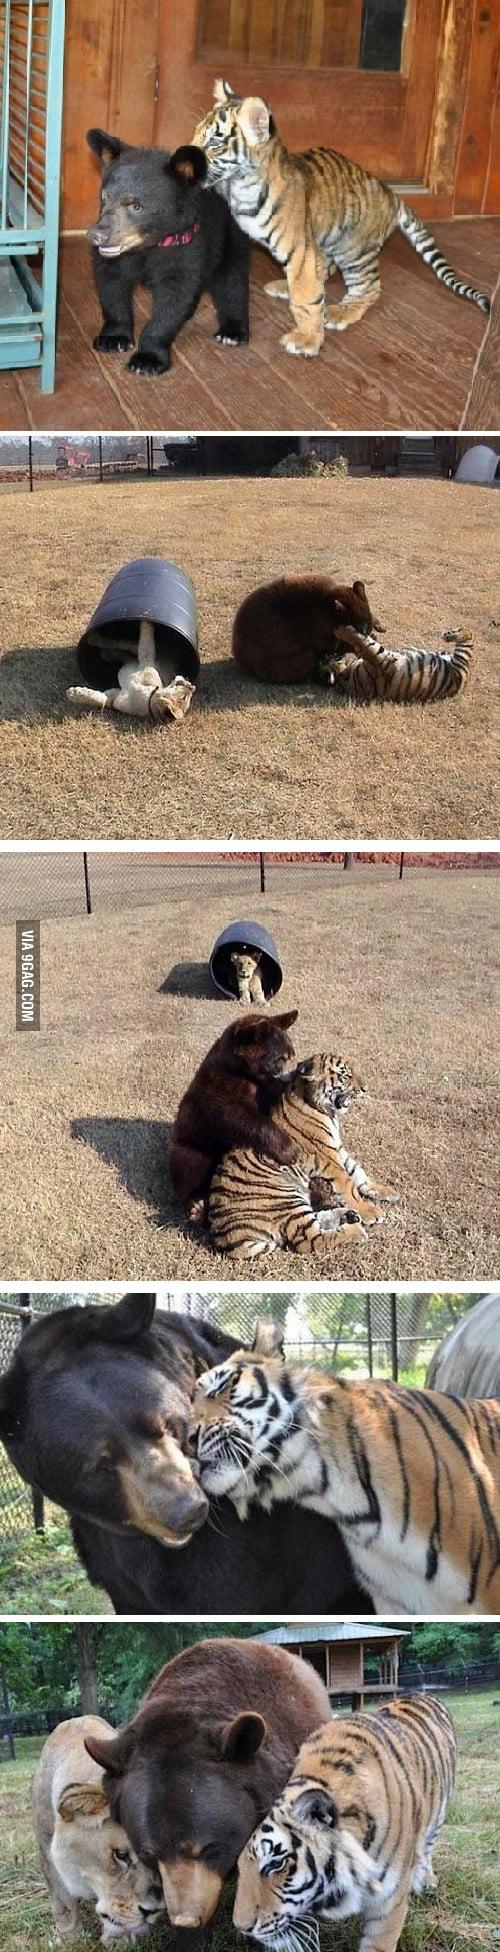 Lion, tiger and bear raised together after rescue from drug dealer